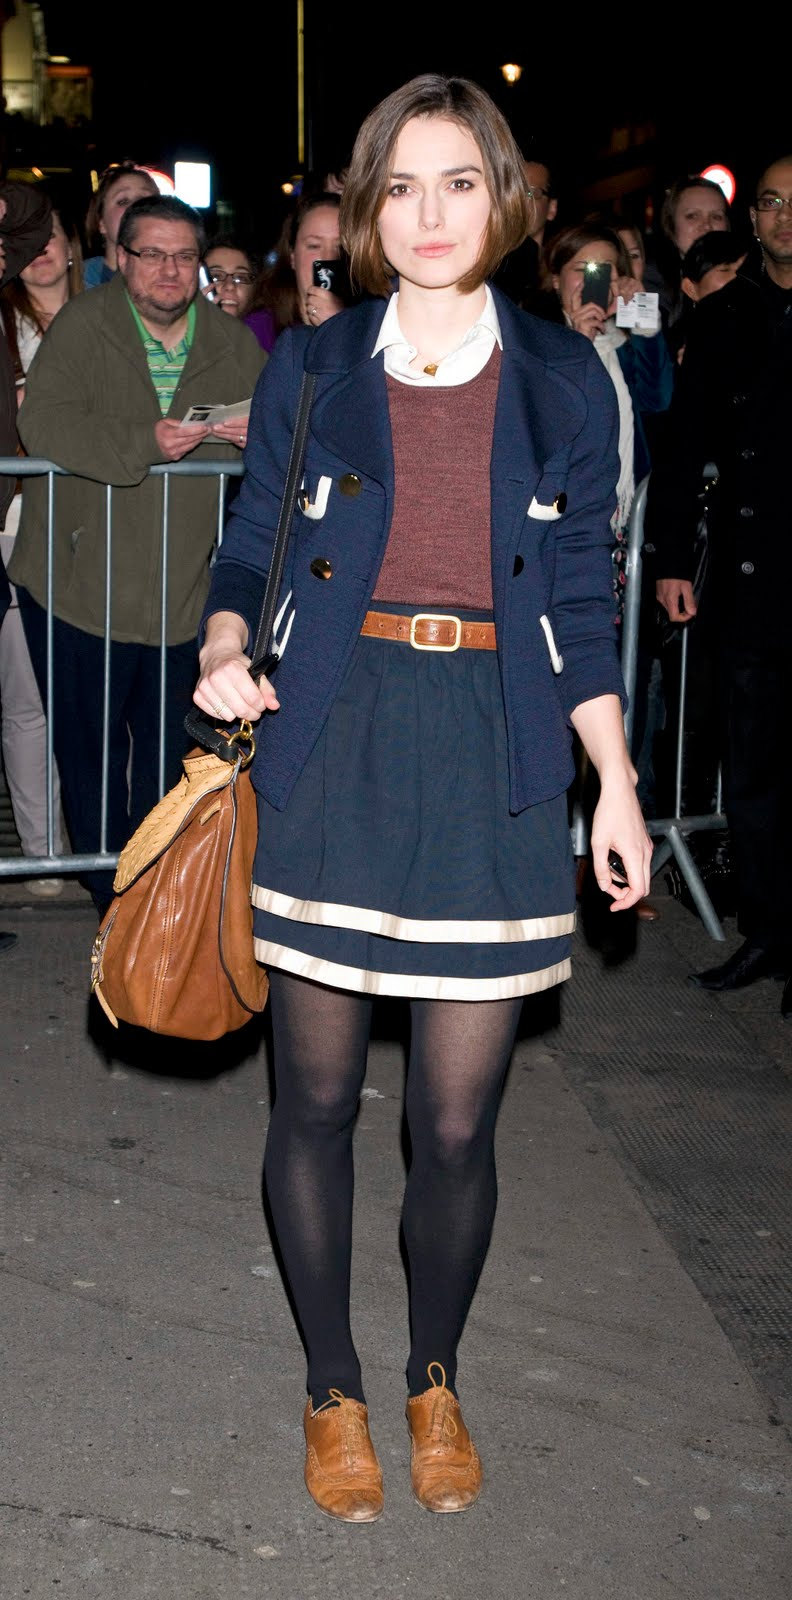 Keira Knightley In Black Nylons